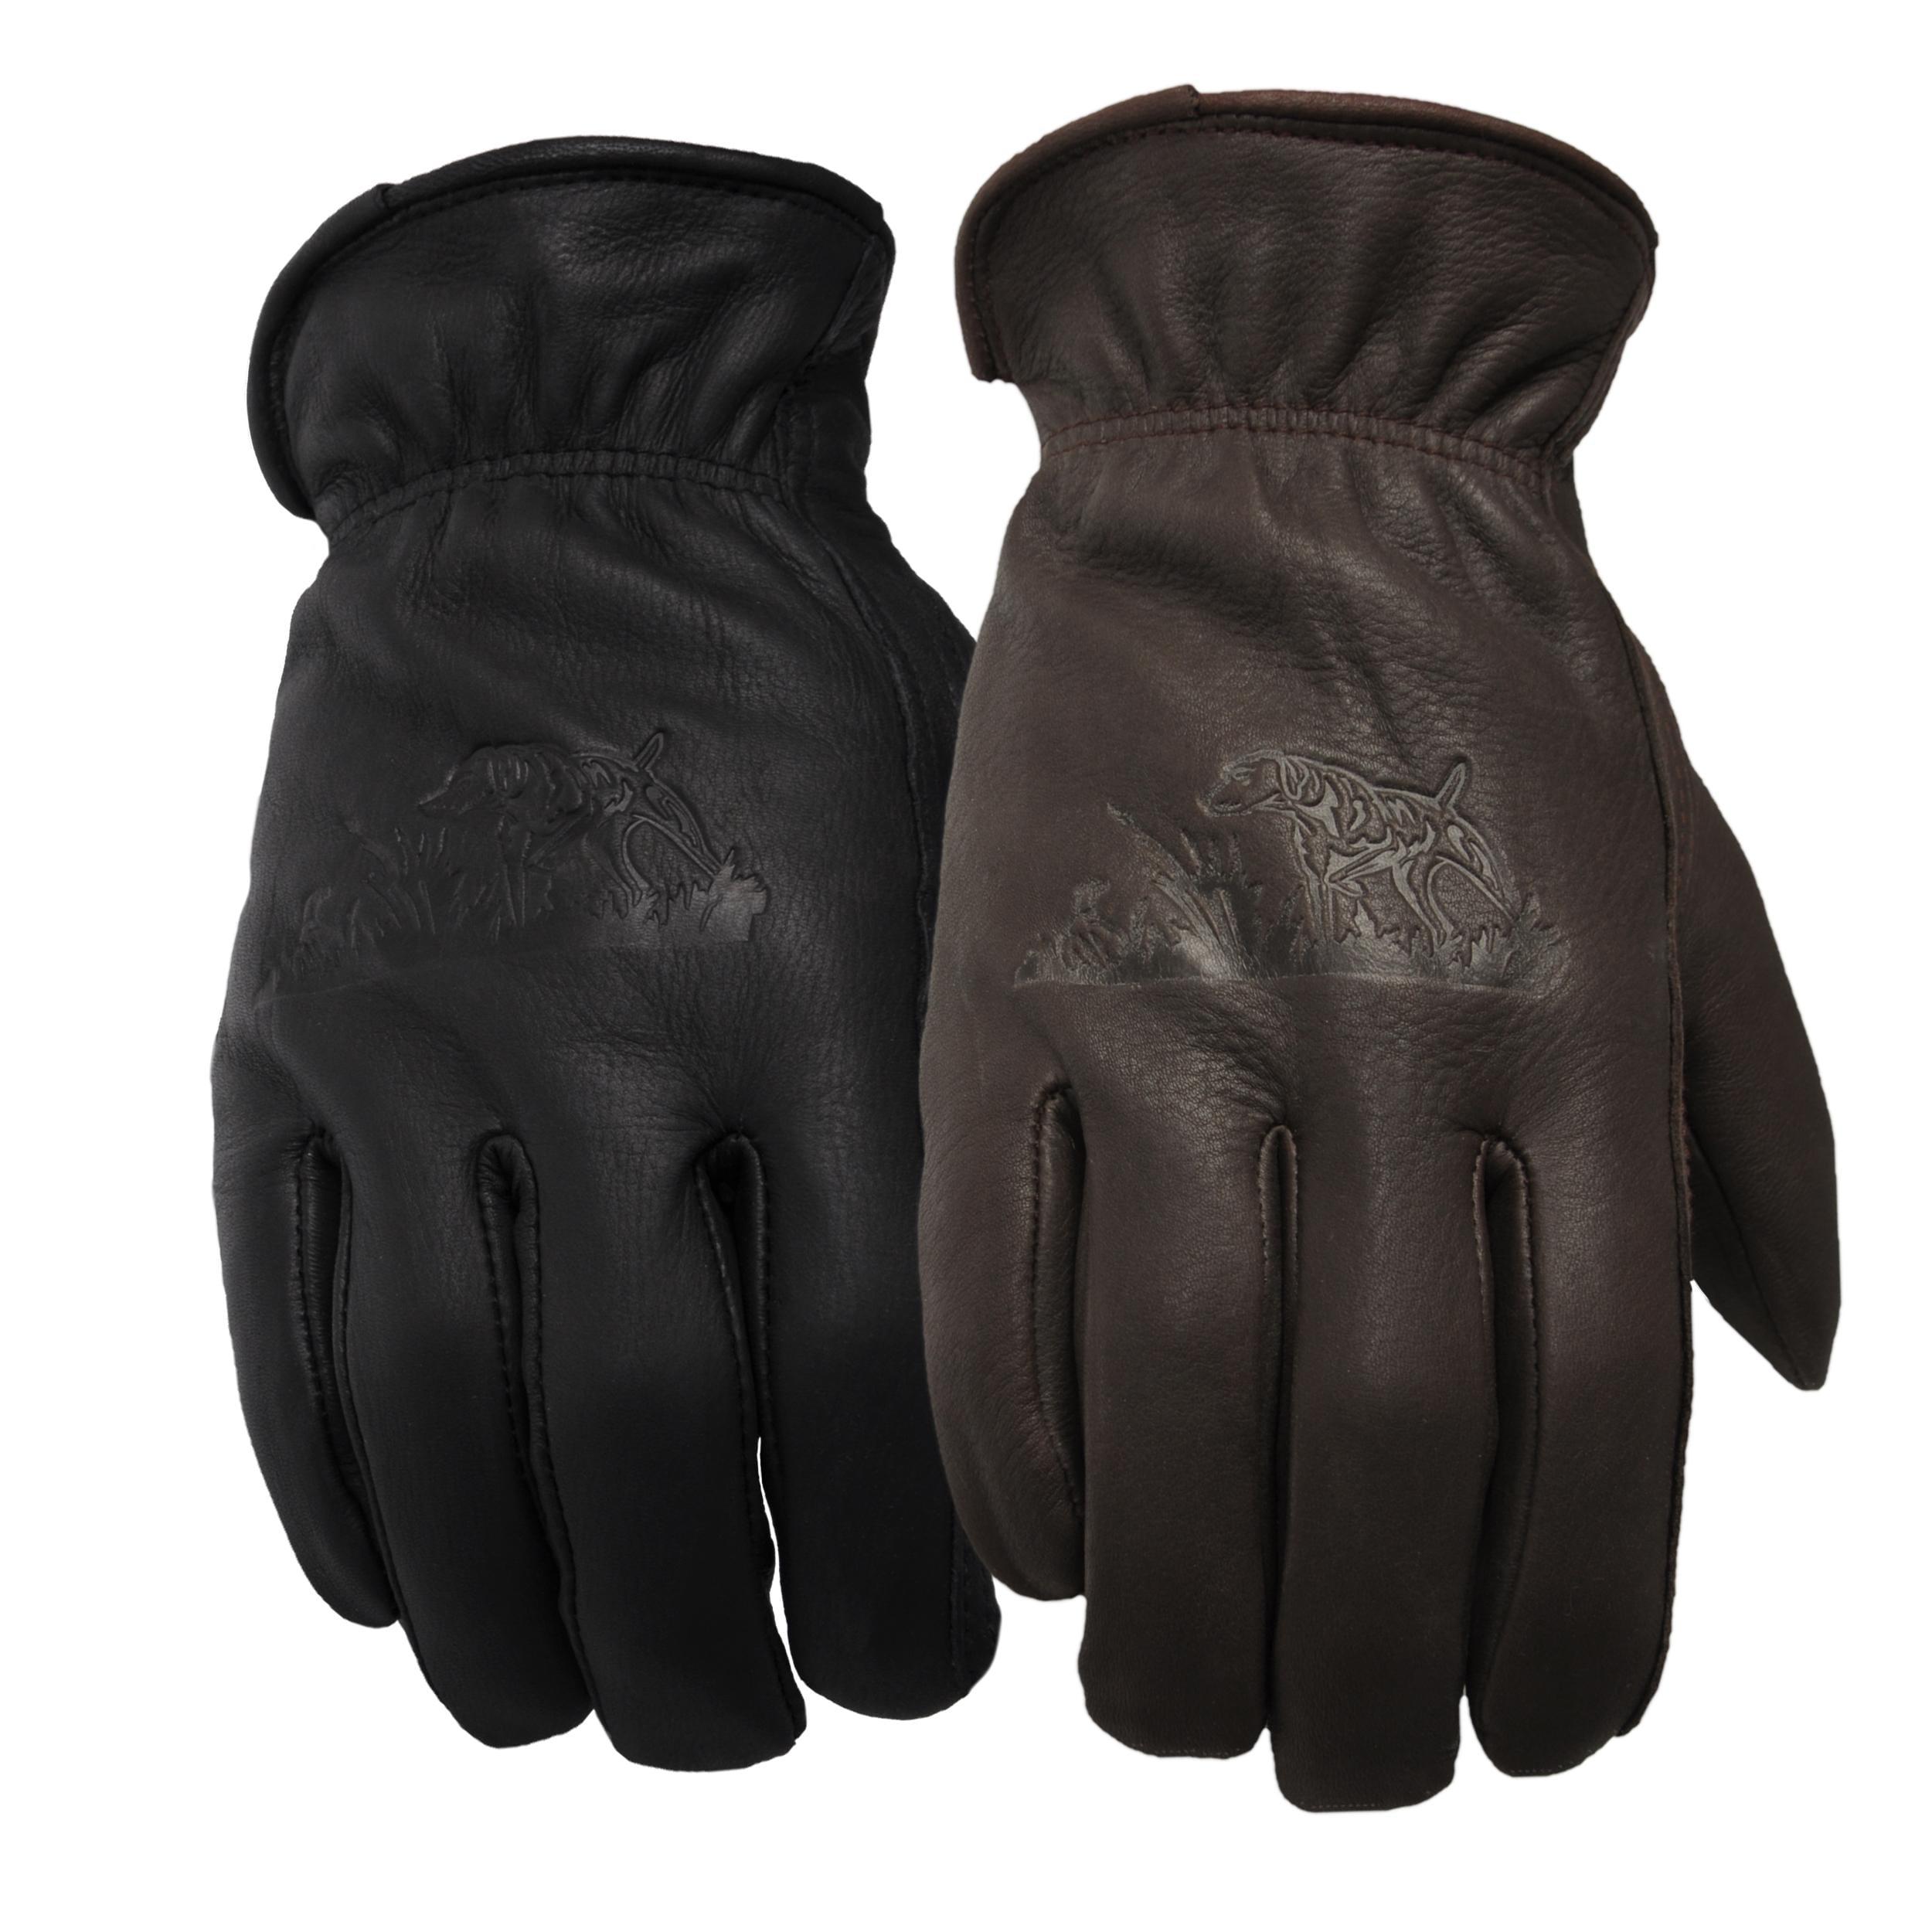 Overstock mens leather gloves - Daxx Men S Top Grain Deerskin Leather Bird Dog Print Lined Gloves